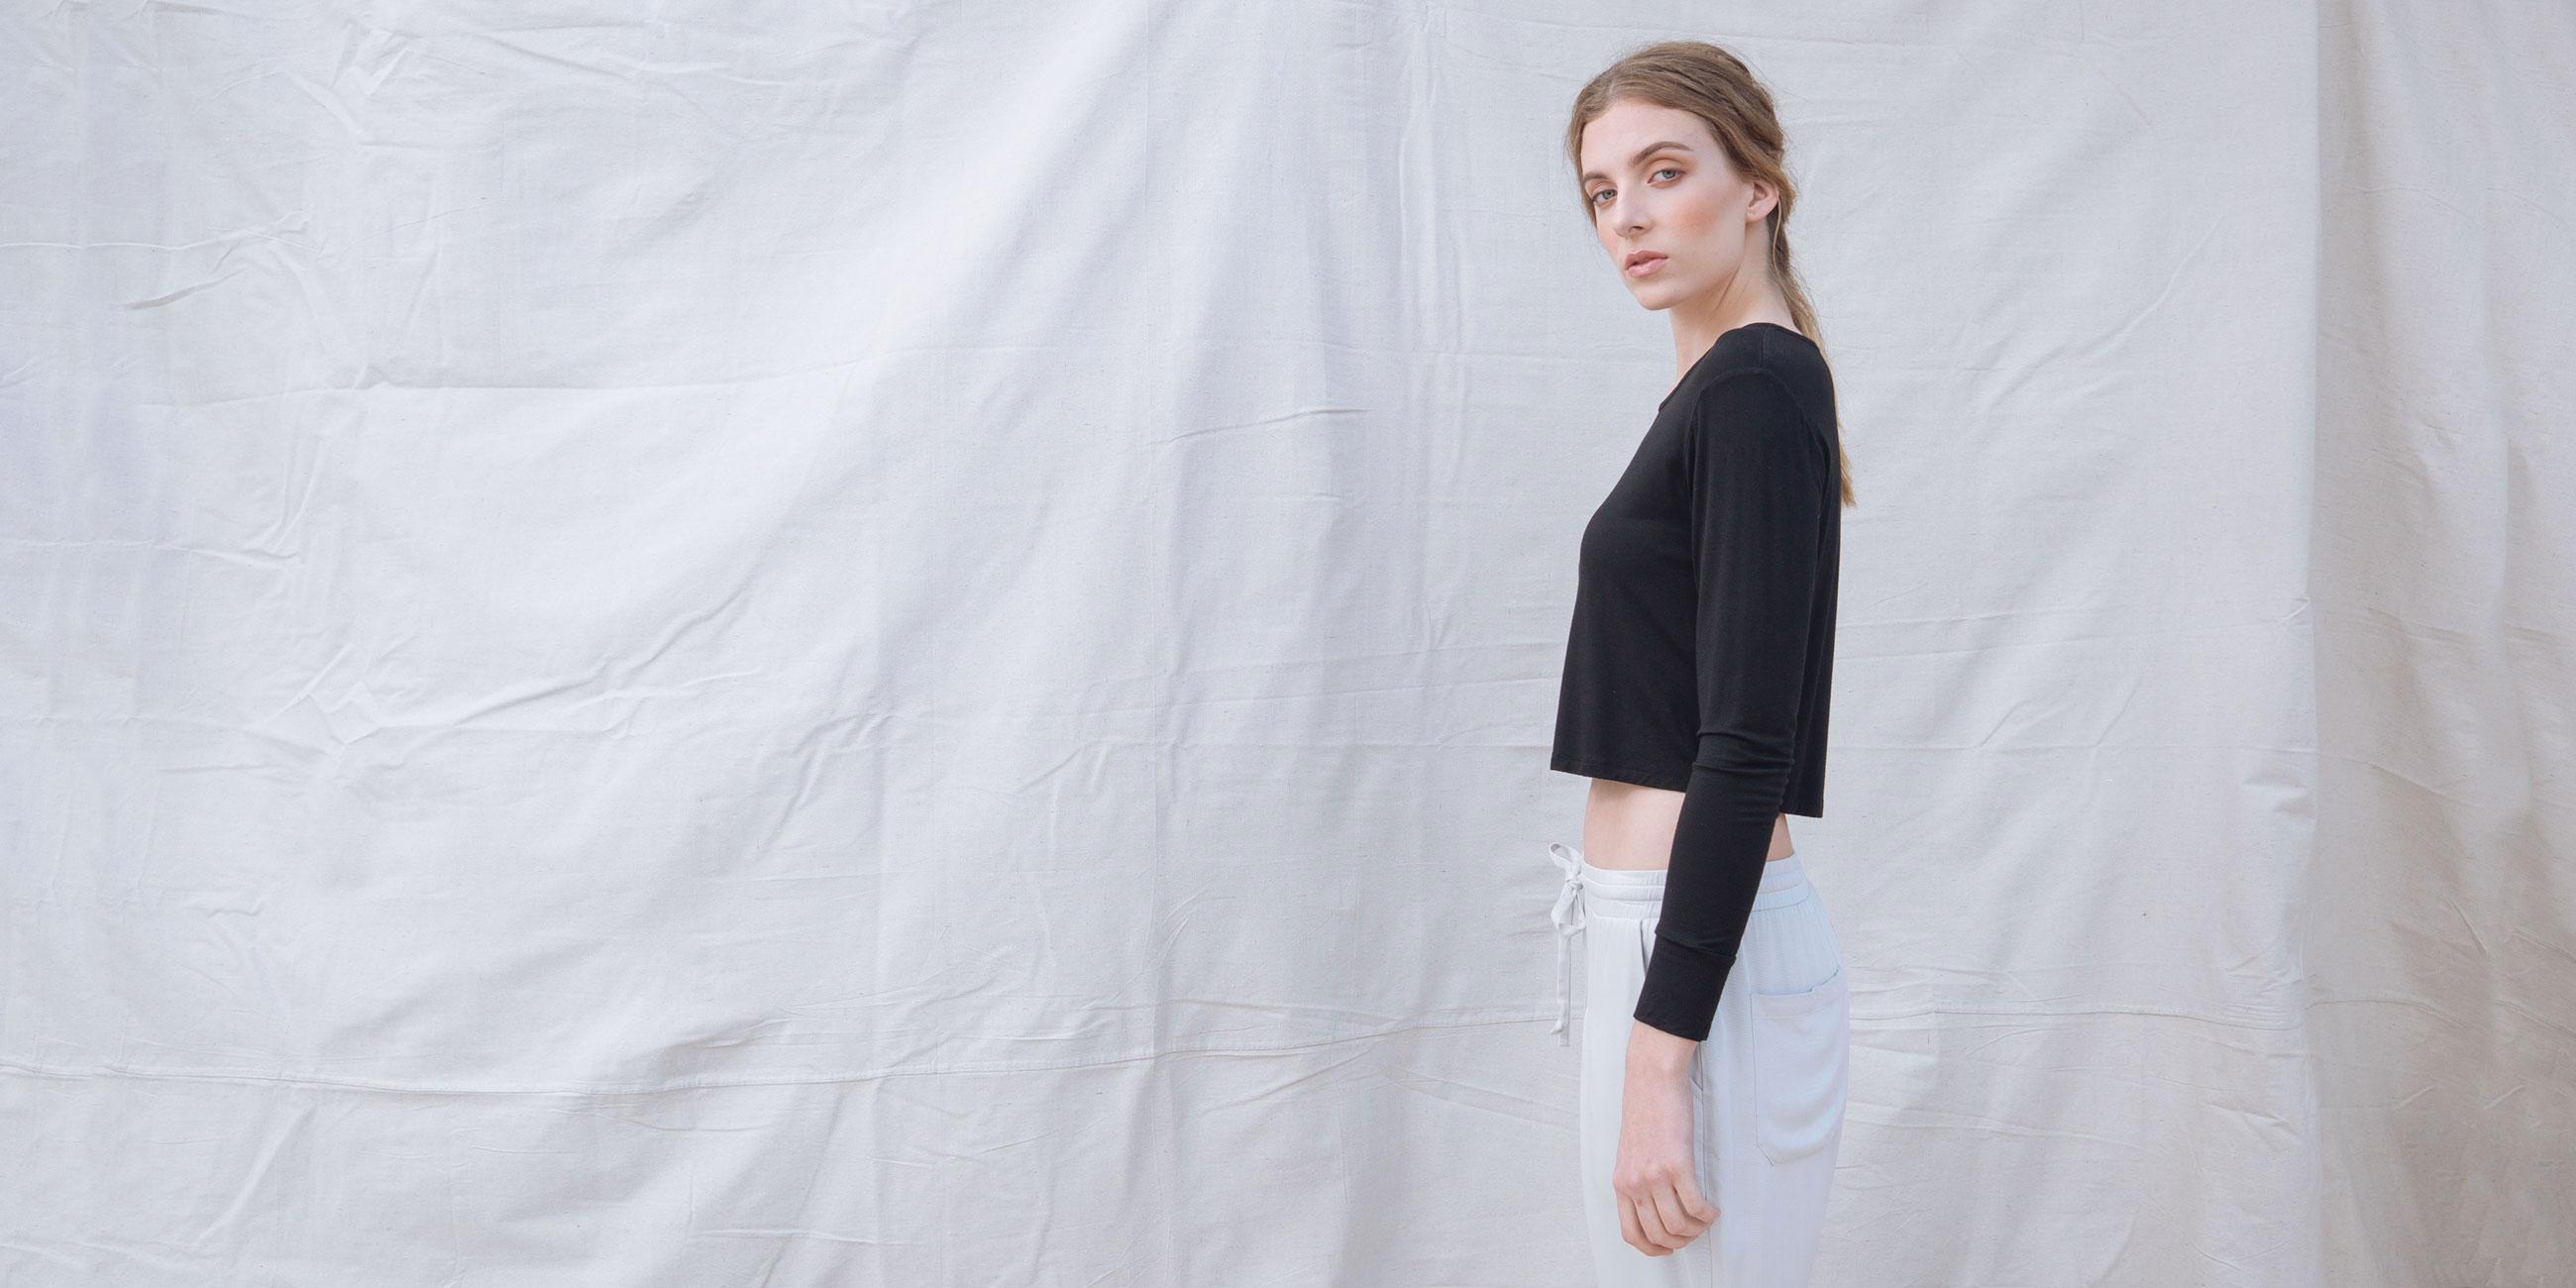 Bamboo Crop Top Black Long Sleeve Europa 3